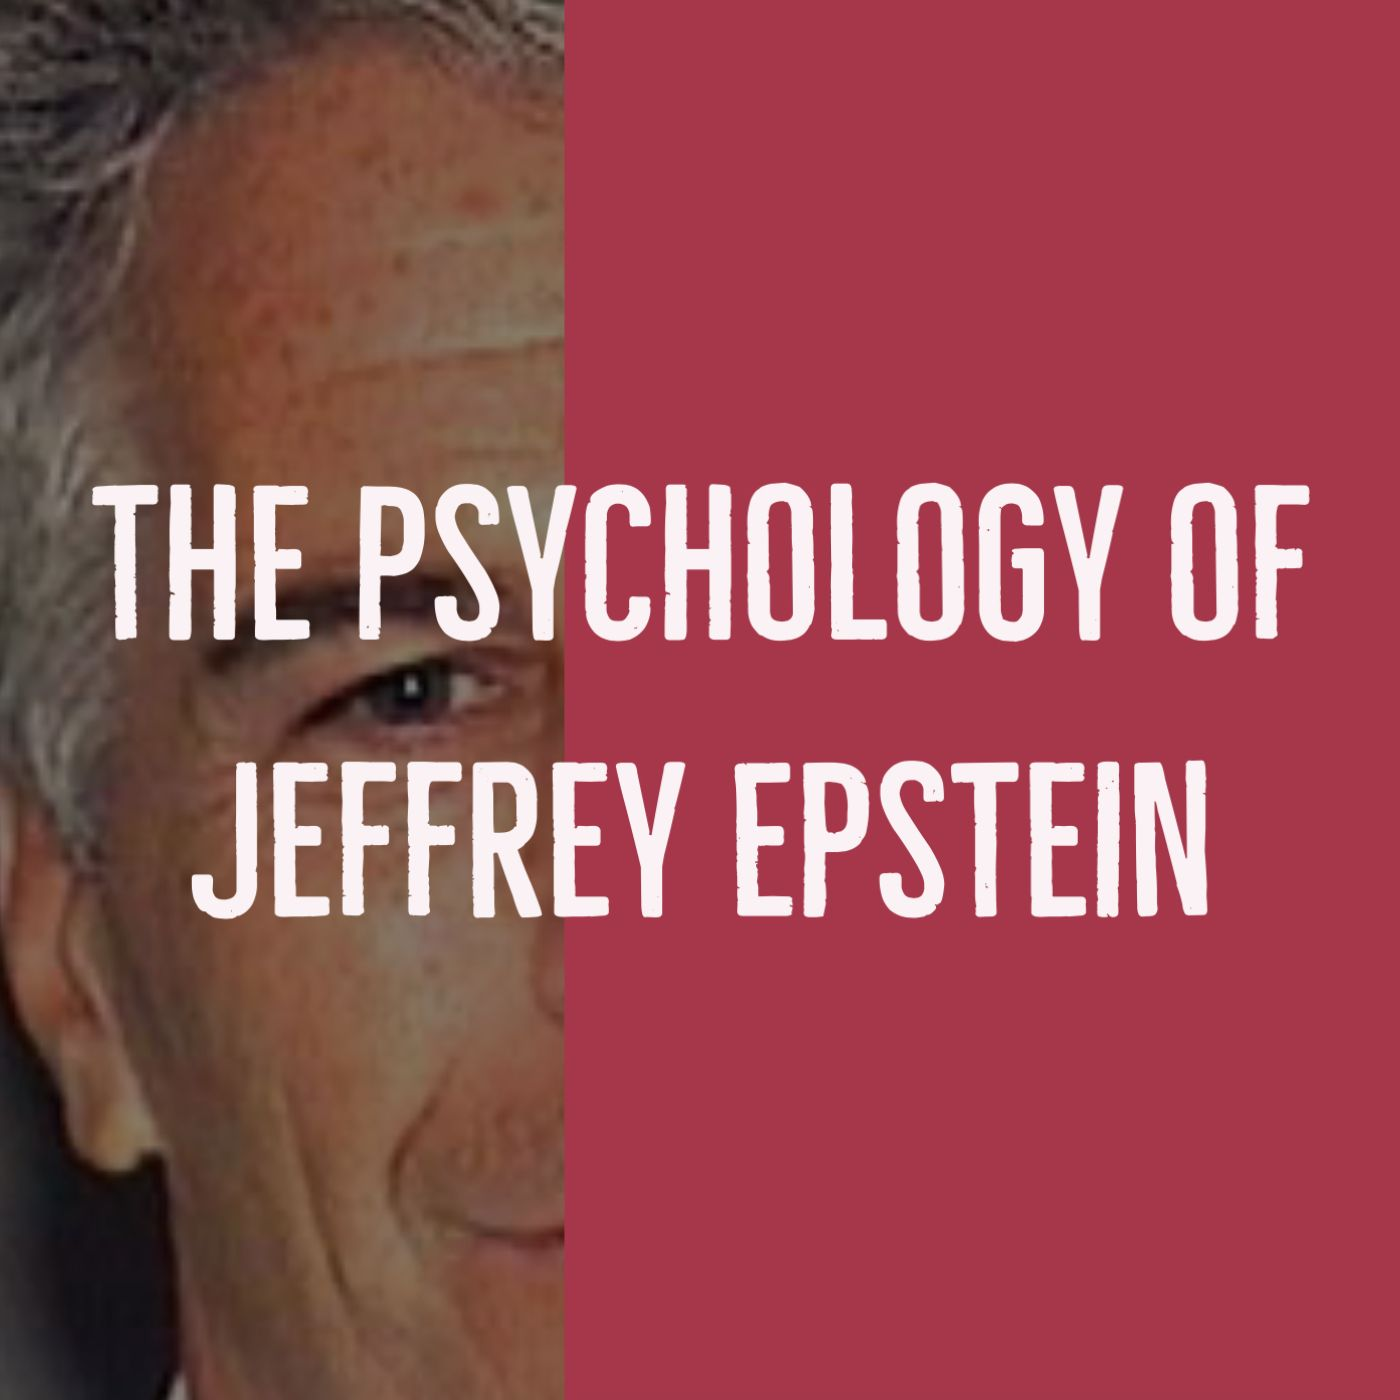 The Psychology of Jeffrey Epstein